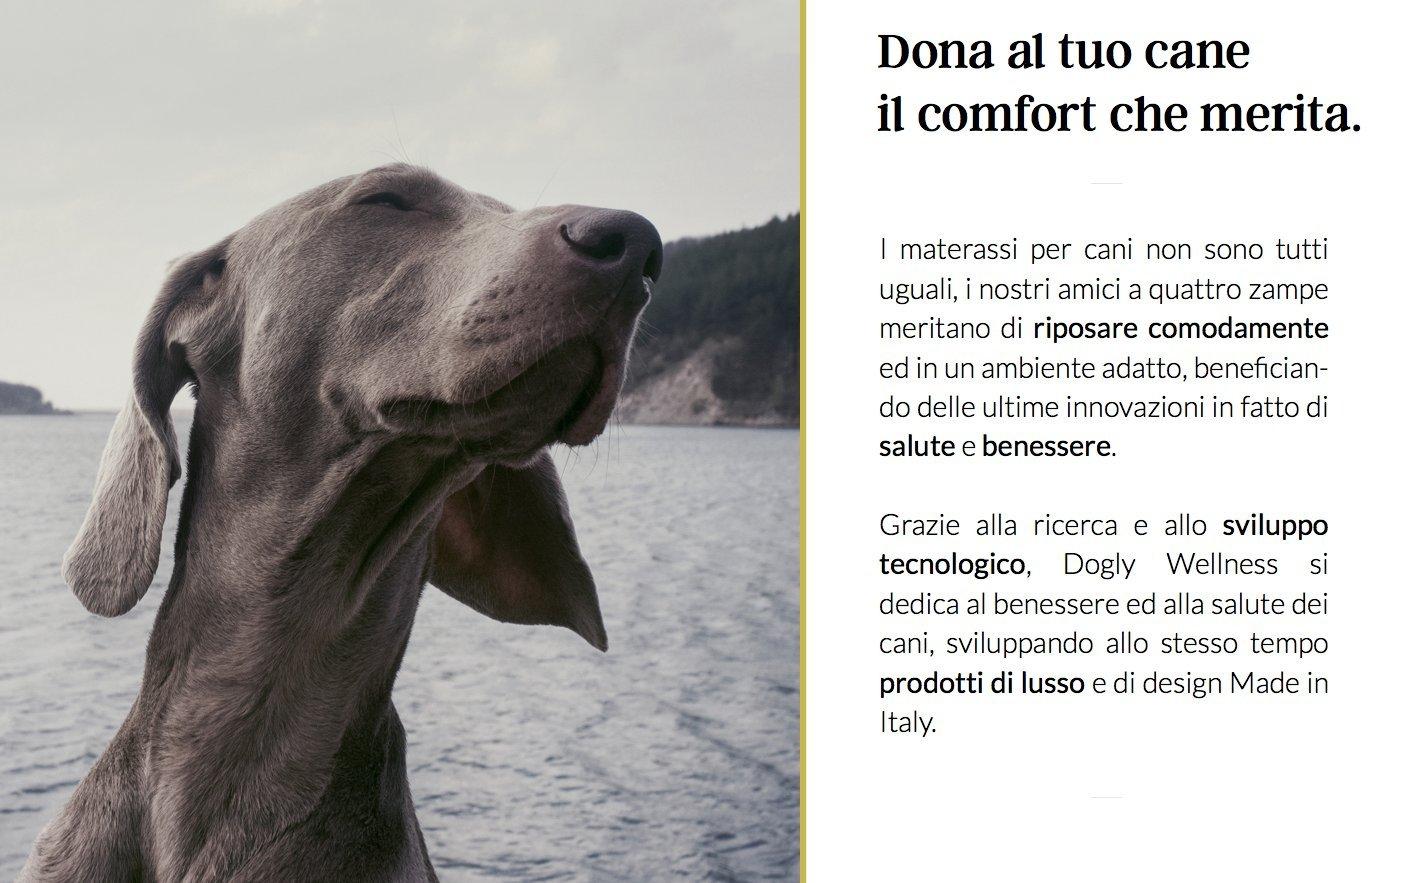 Dogly Wellness para Perros Caseta cojín Cama Alfombrilla colchón Memory ortopédico Lusso Italiano Benessere BREVETTI Celliant resistat- Large: Amazon.es: ...